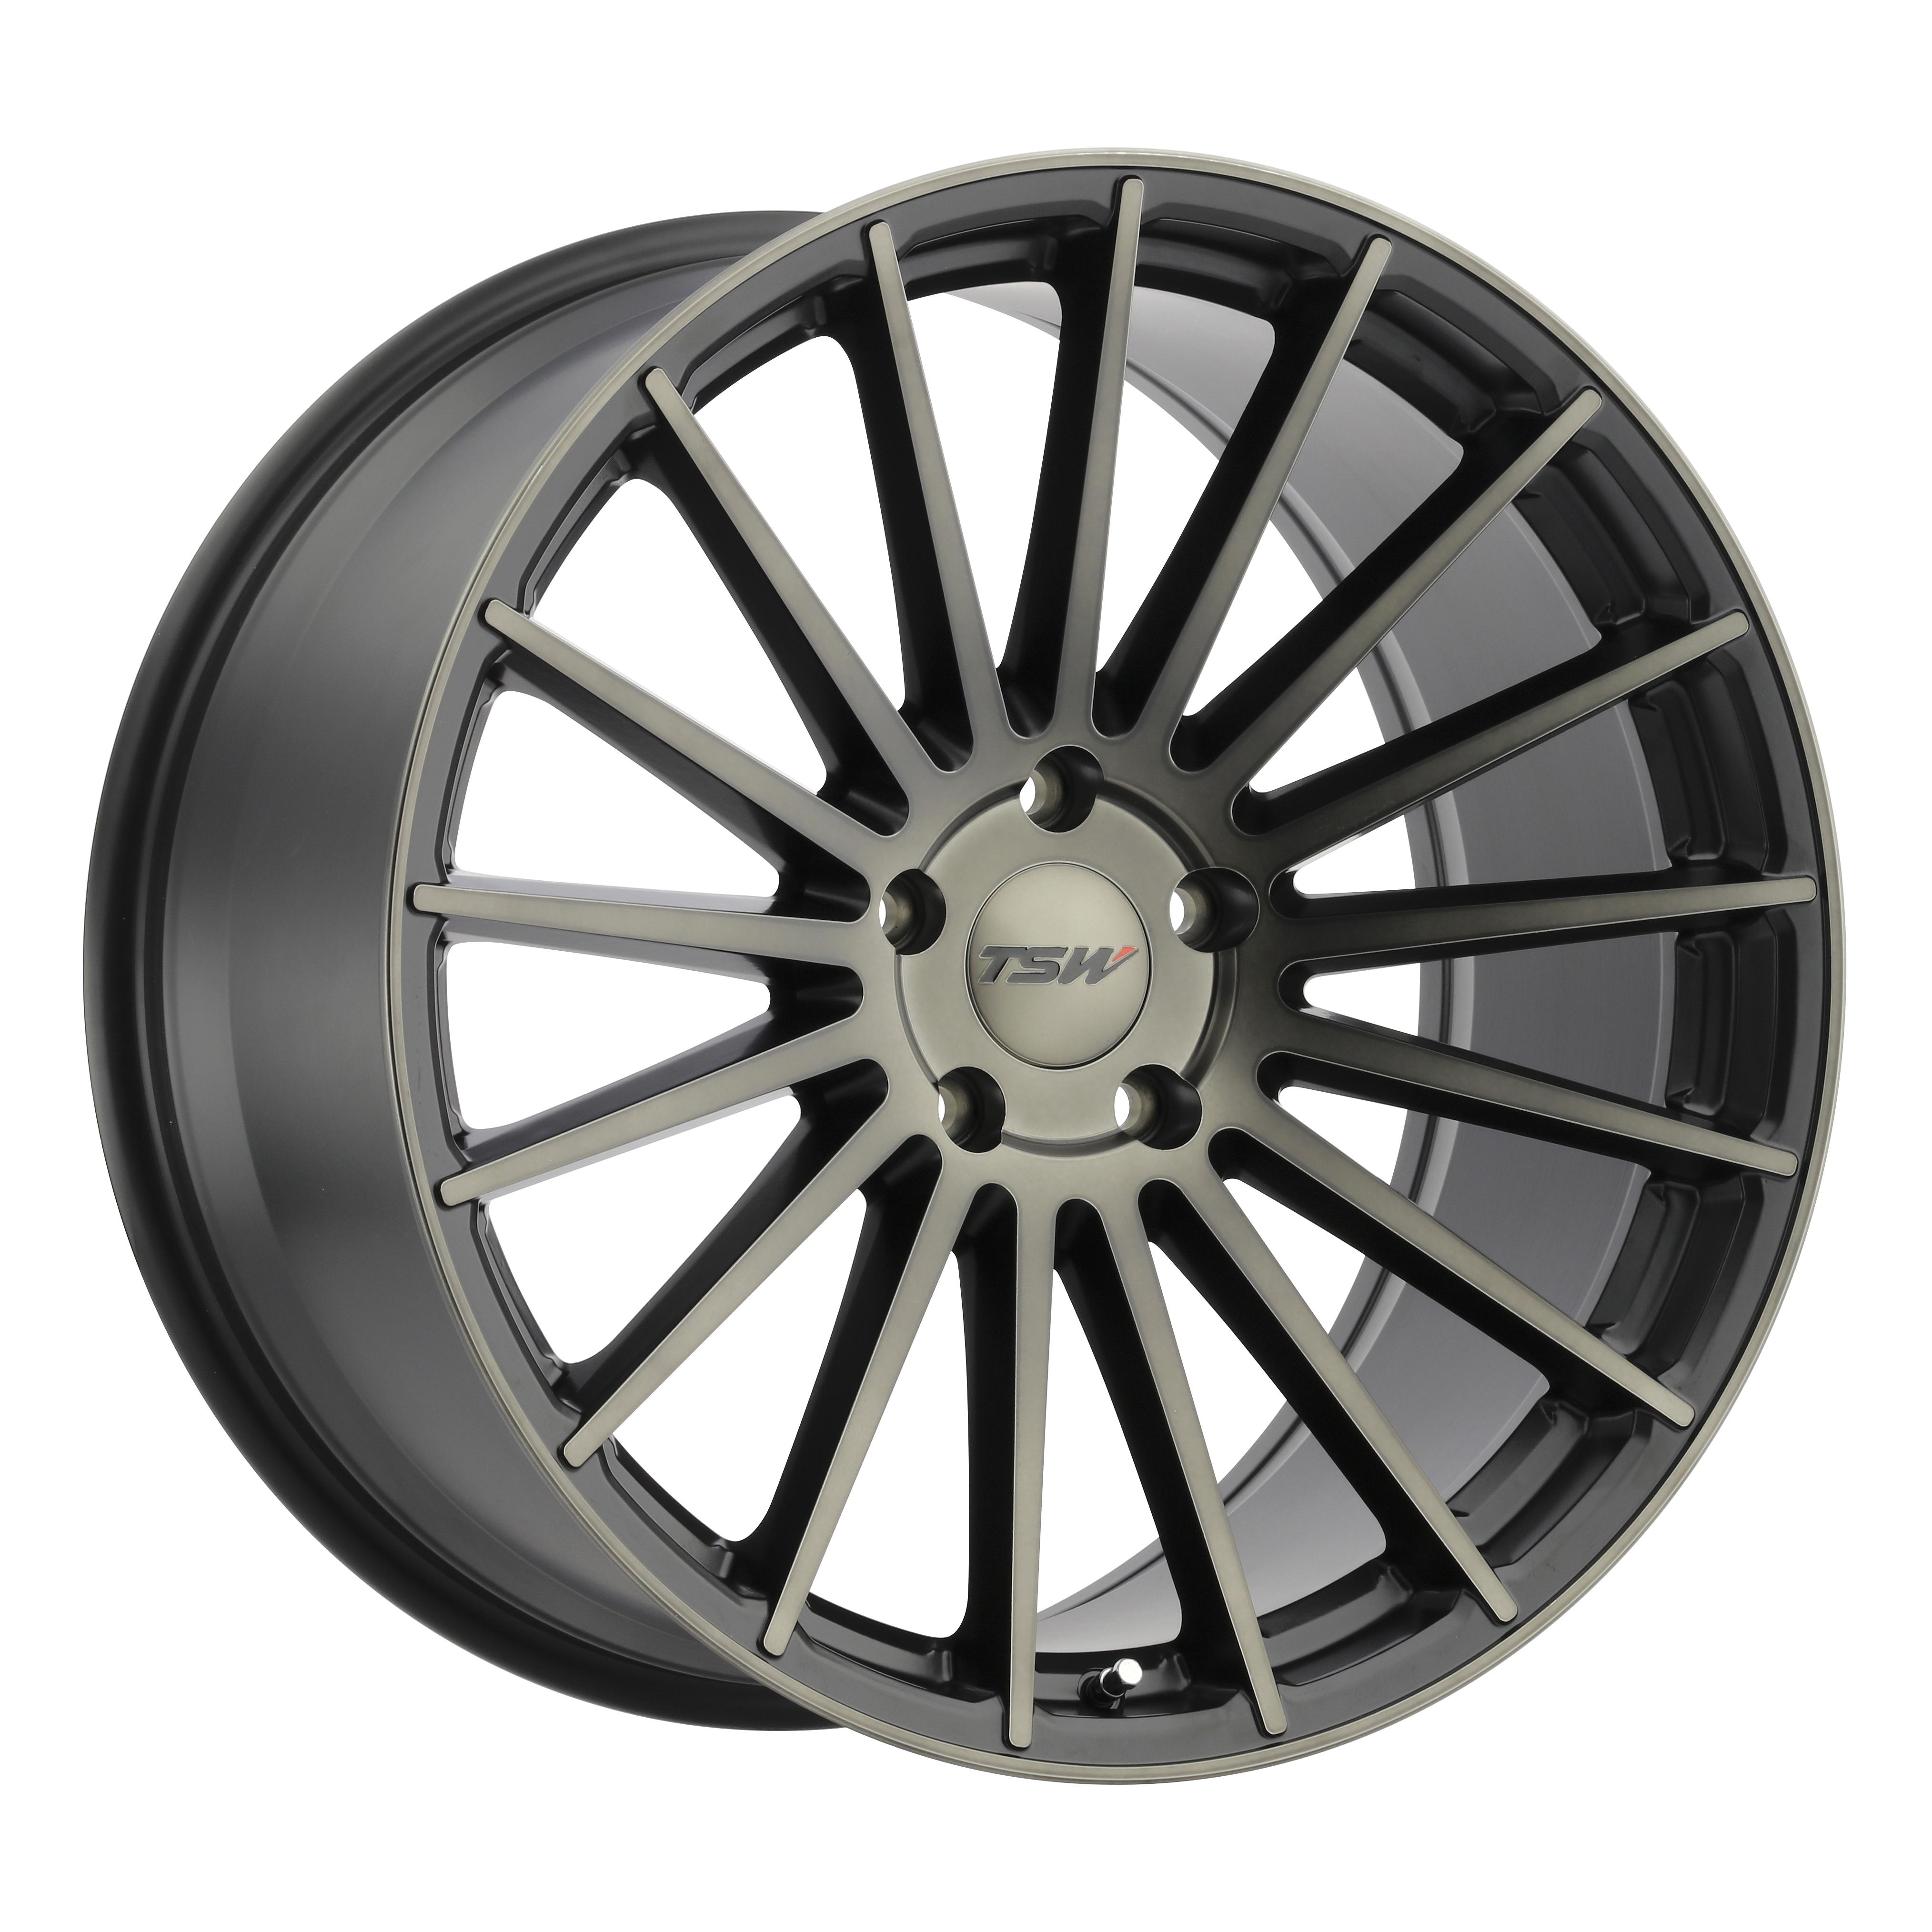 alloy-wheels-rims-tsw-luco-5-lug-matte-black-machine-face-dark-tint-std-org.jpg